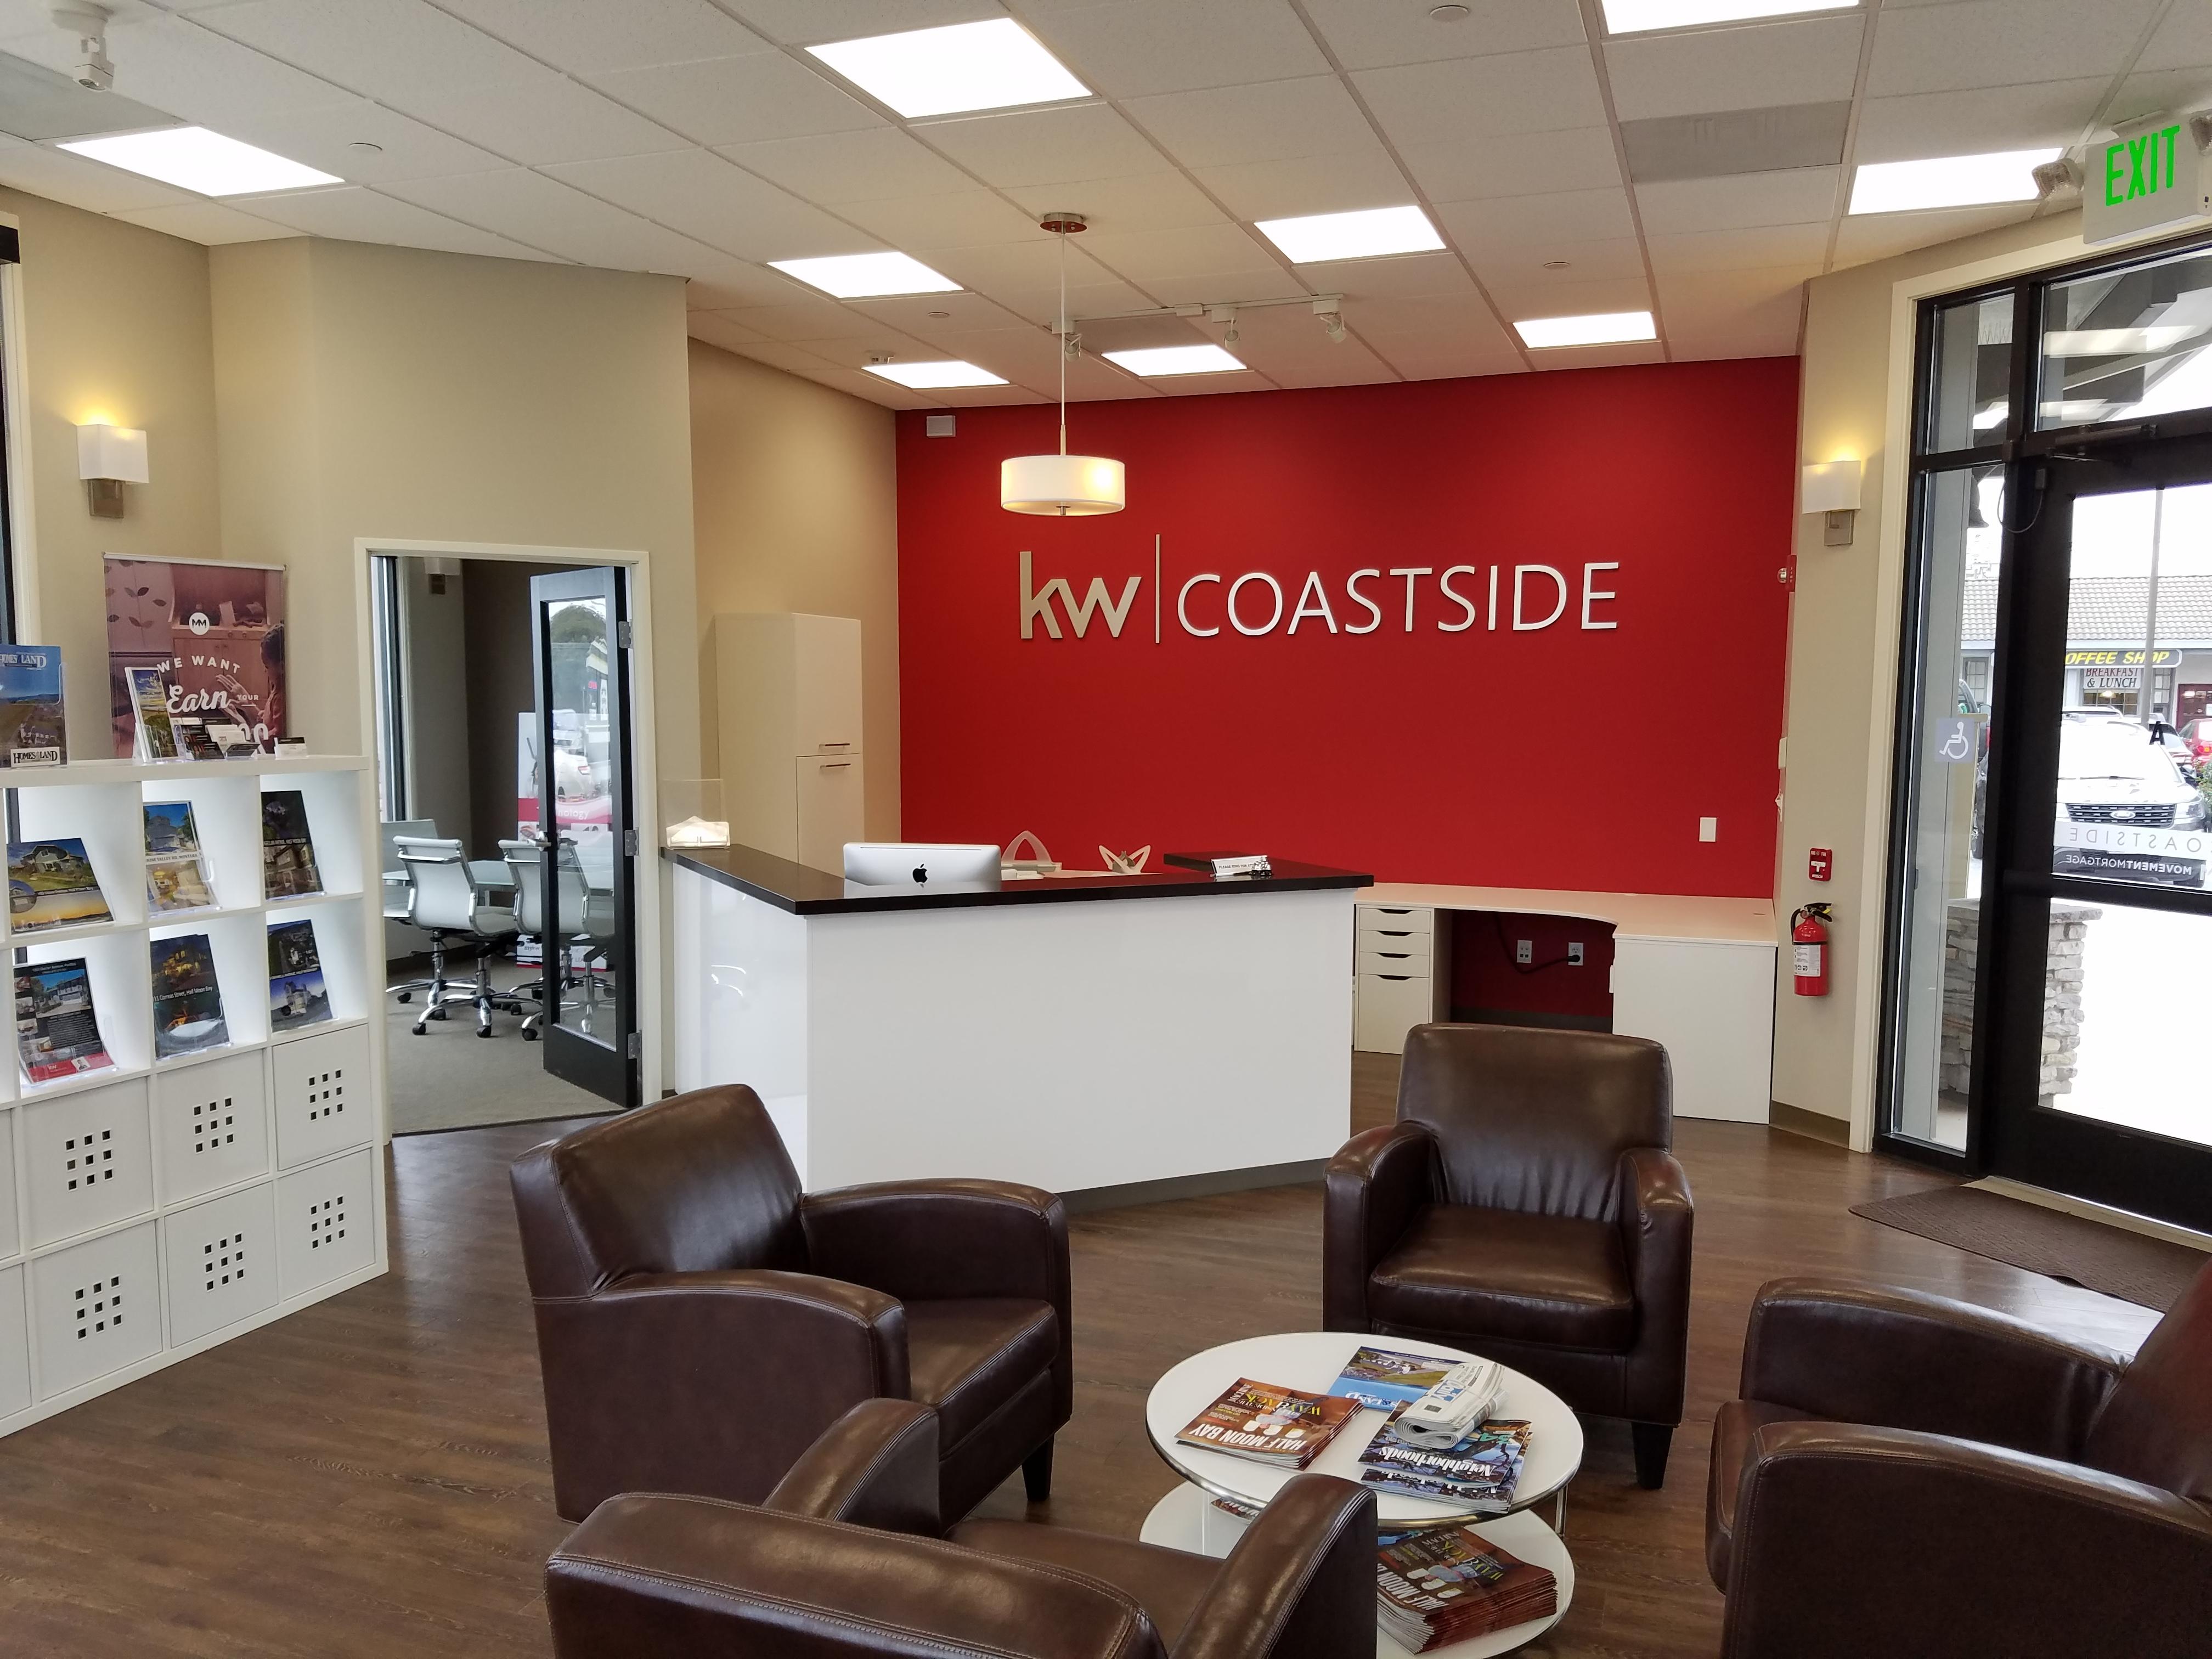 Keller Williams Coastside - Glen Mitchell Group | 200 San Mateo Rd, Half Moon Bay, CA, 94019 | +1 (650) 260-4536